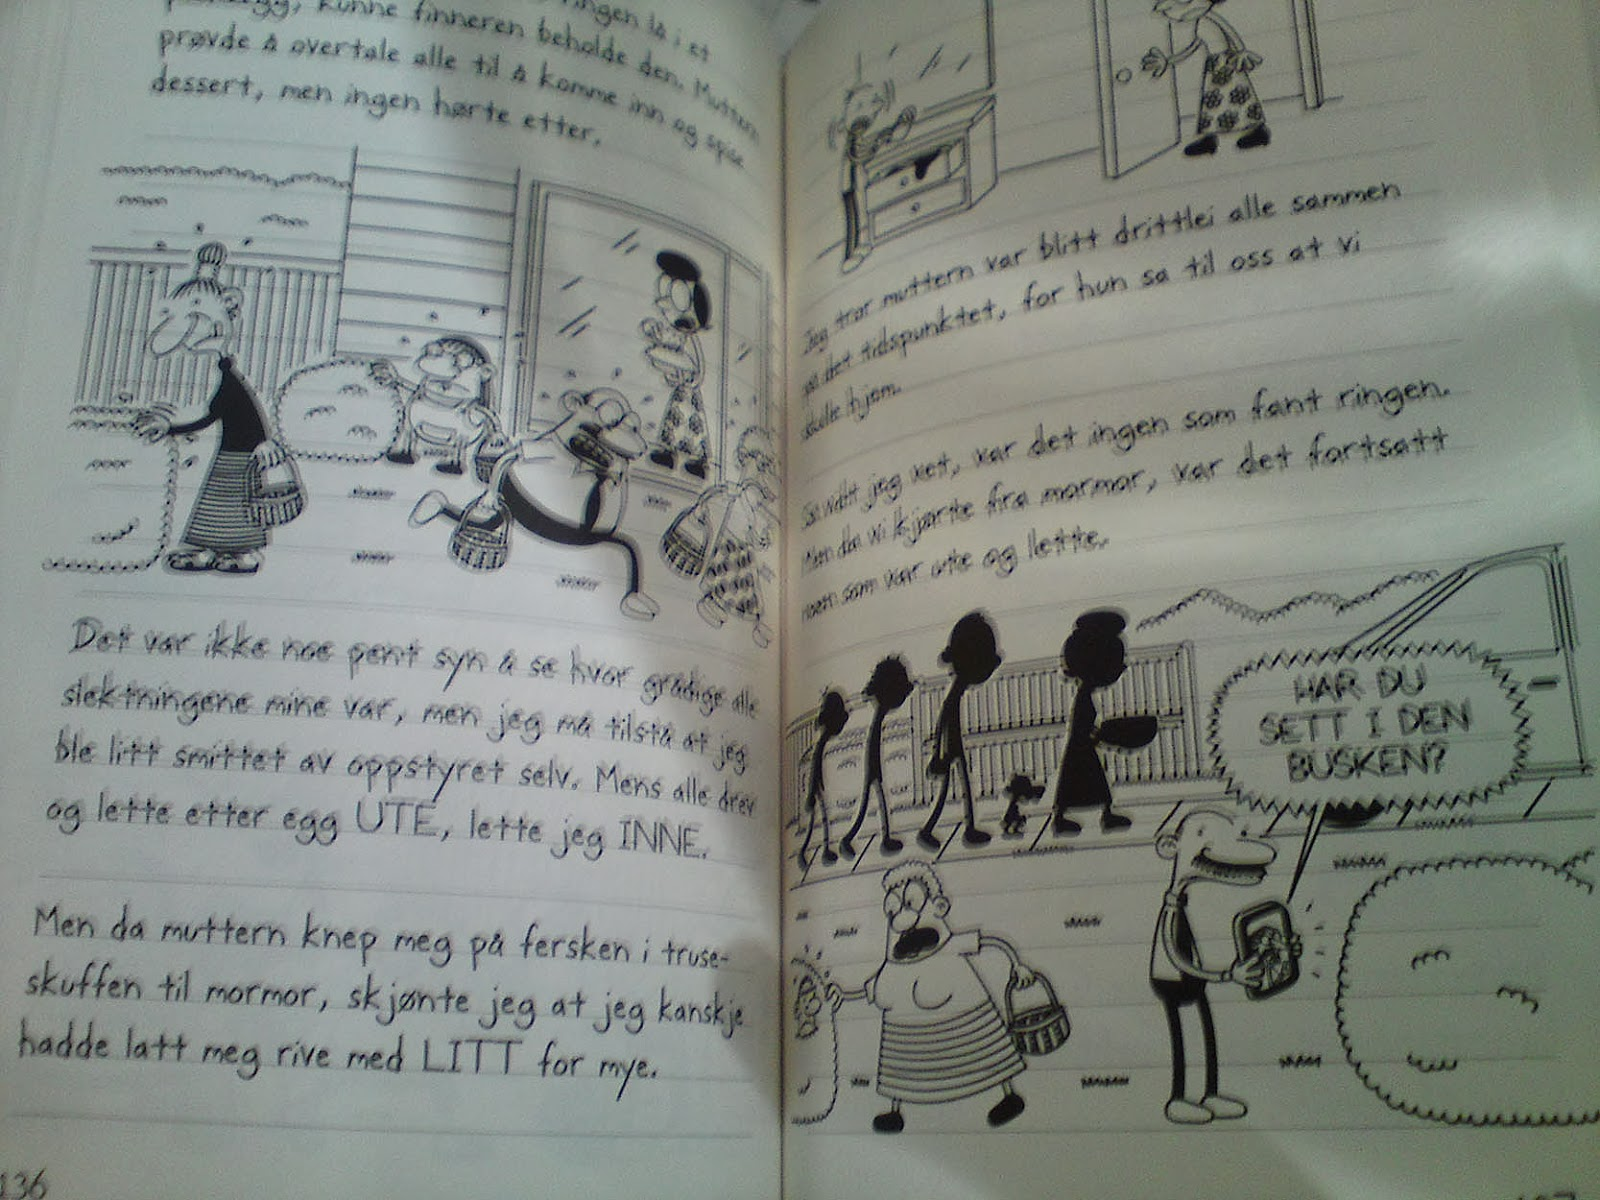 pingles dagbok forfatter